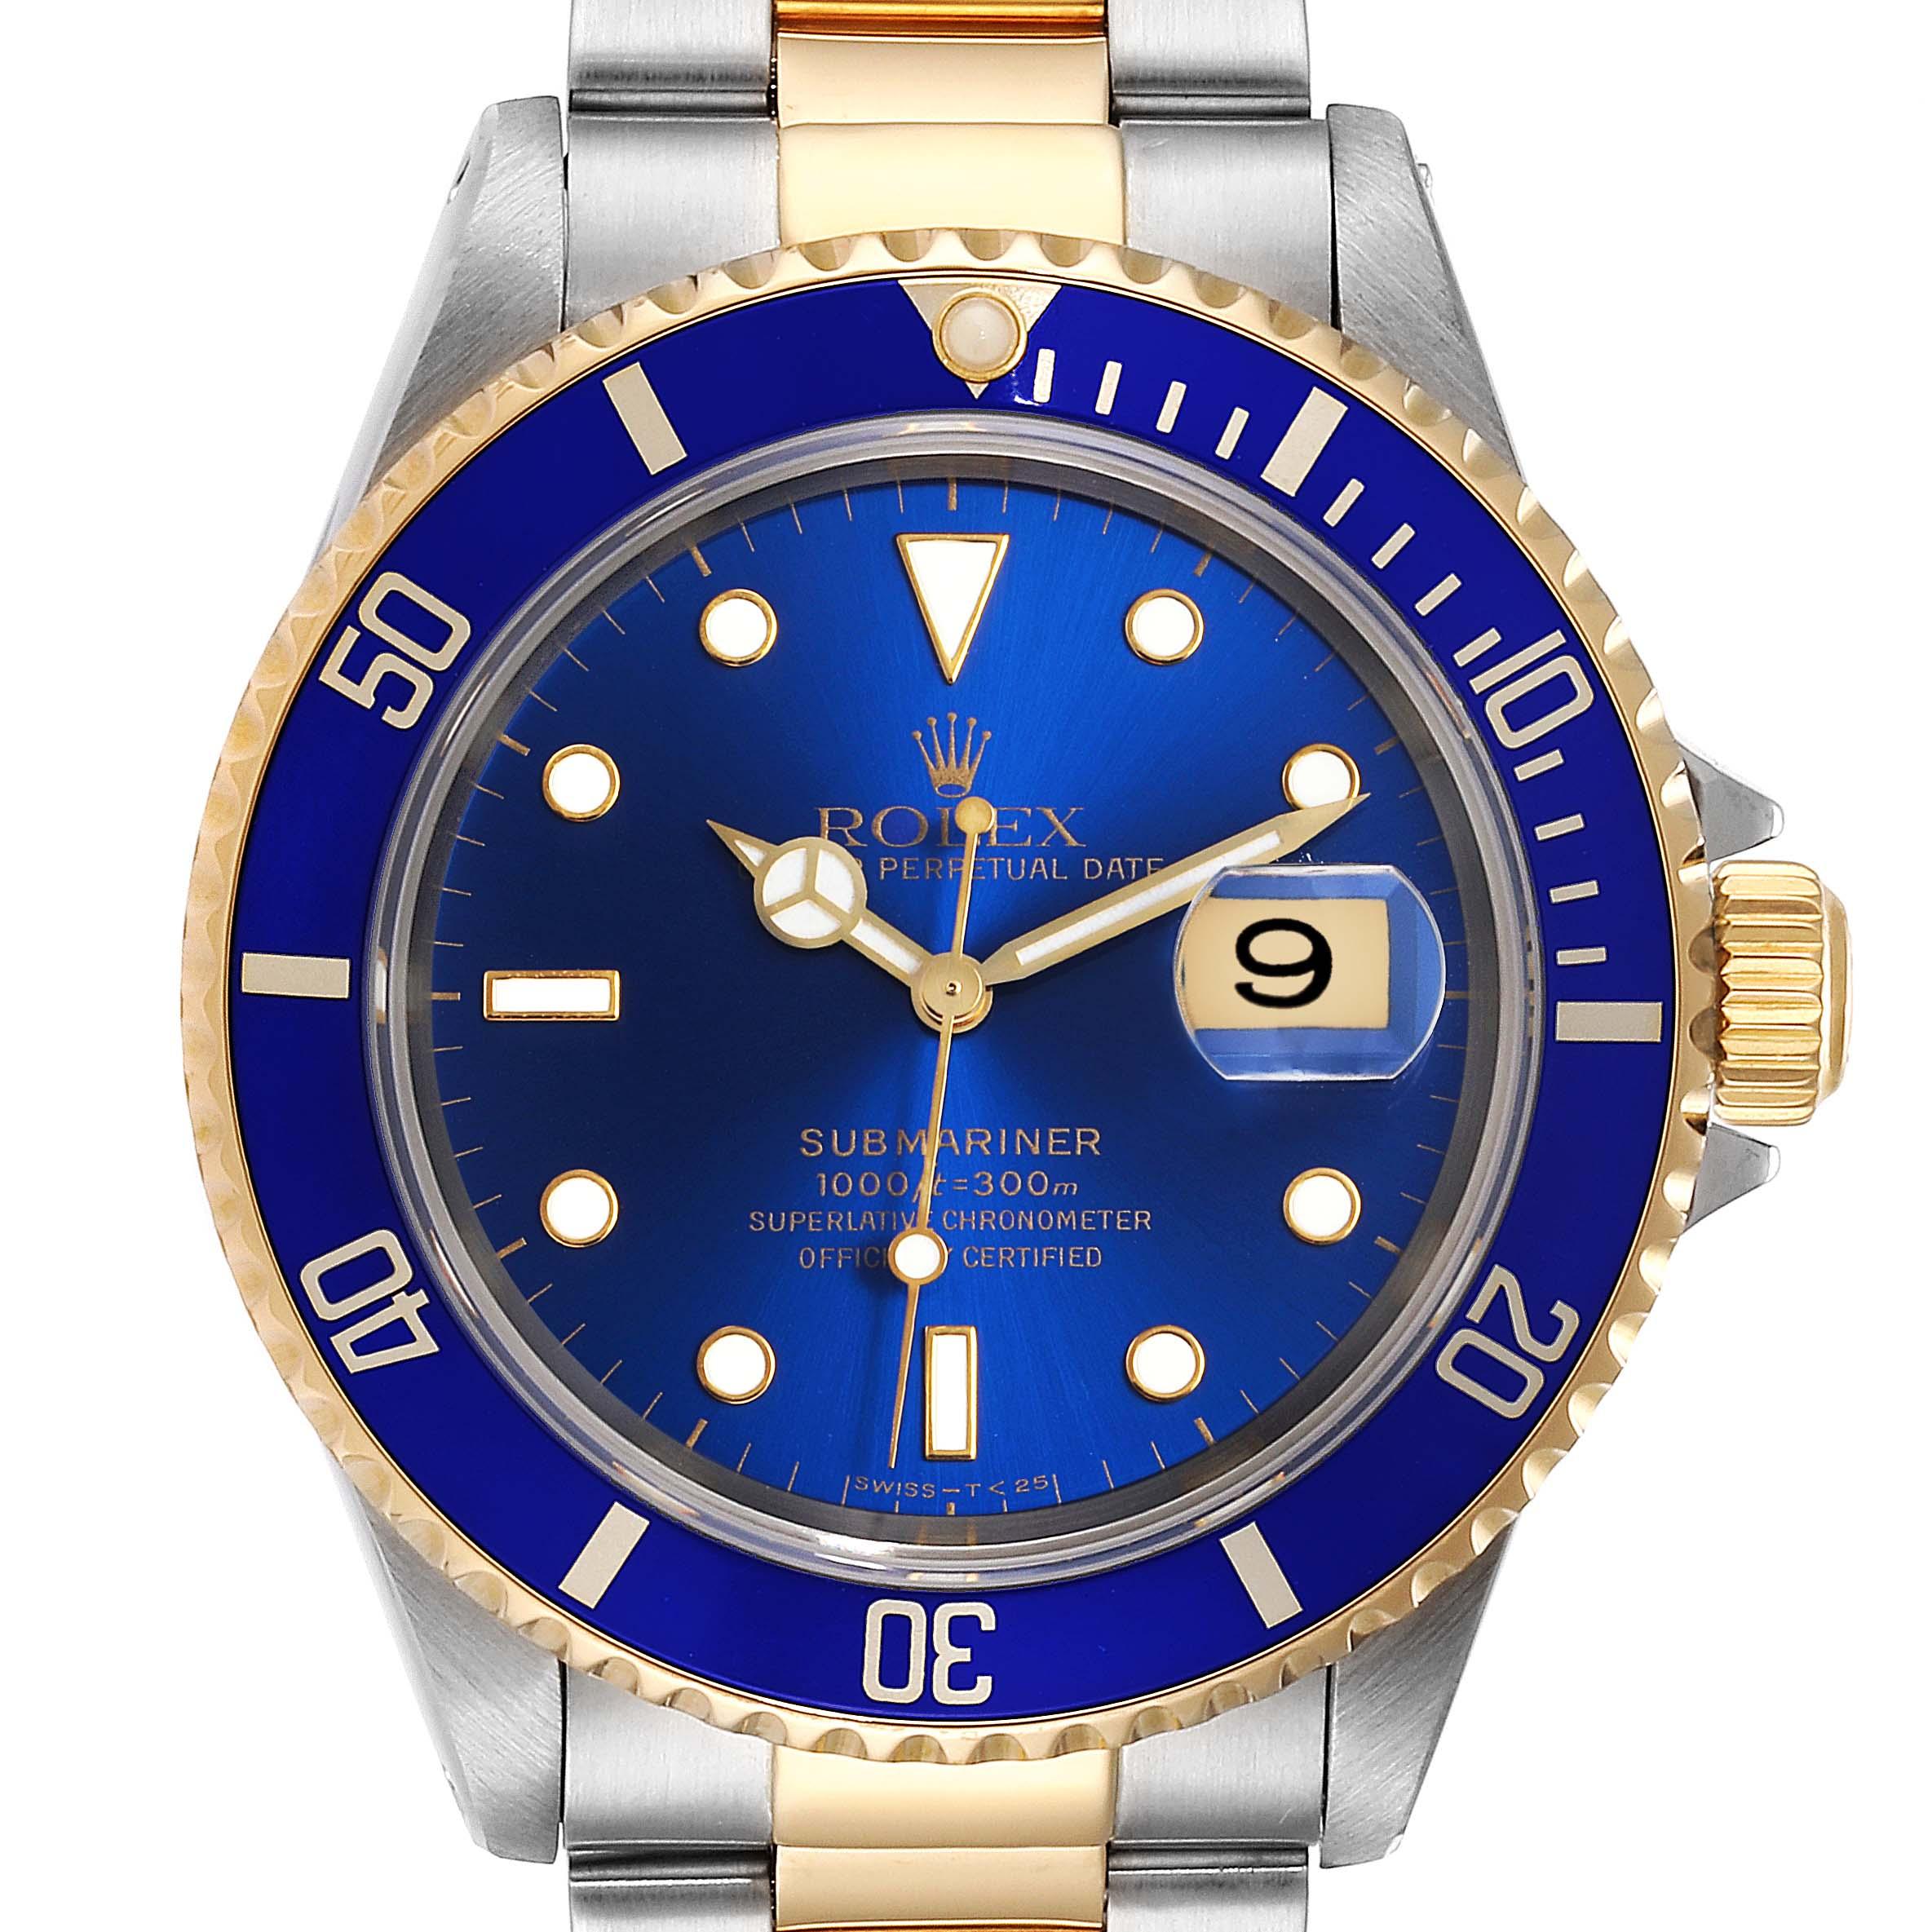 Photo of Rolex Submariner Blue Dial Bezel Steel Yellow Gold Mens Watch 16613